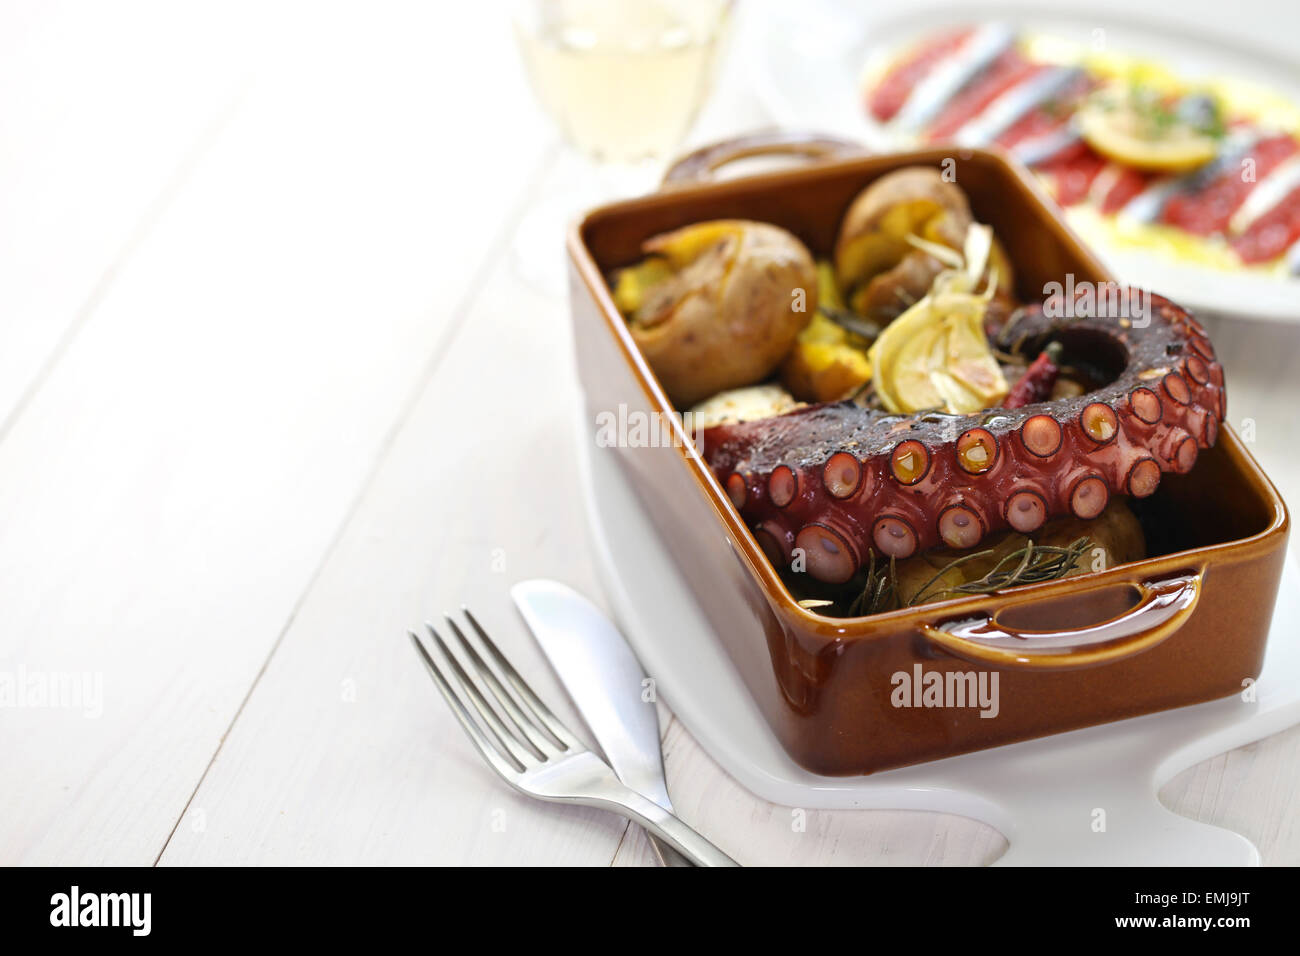 grilled octopus with potatoes, polvo a lagareiro com batata a murro, Portuguese cuisine - Stock Image